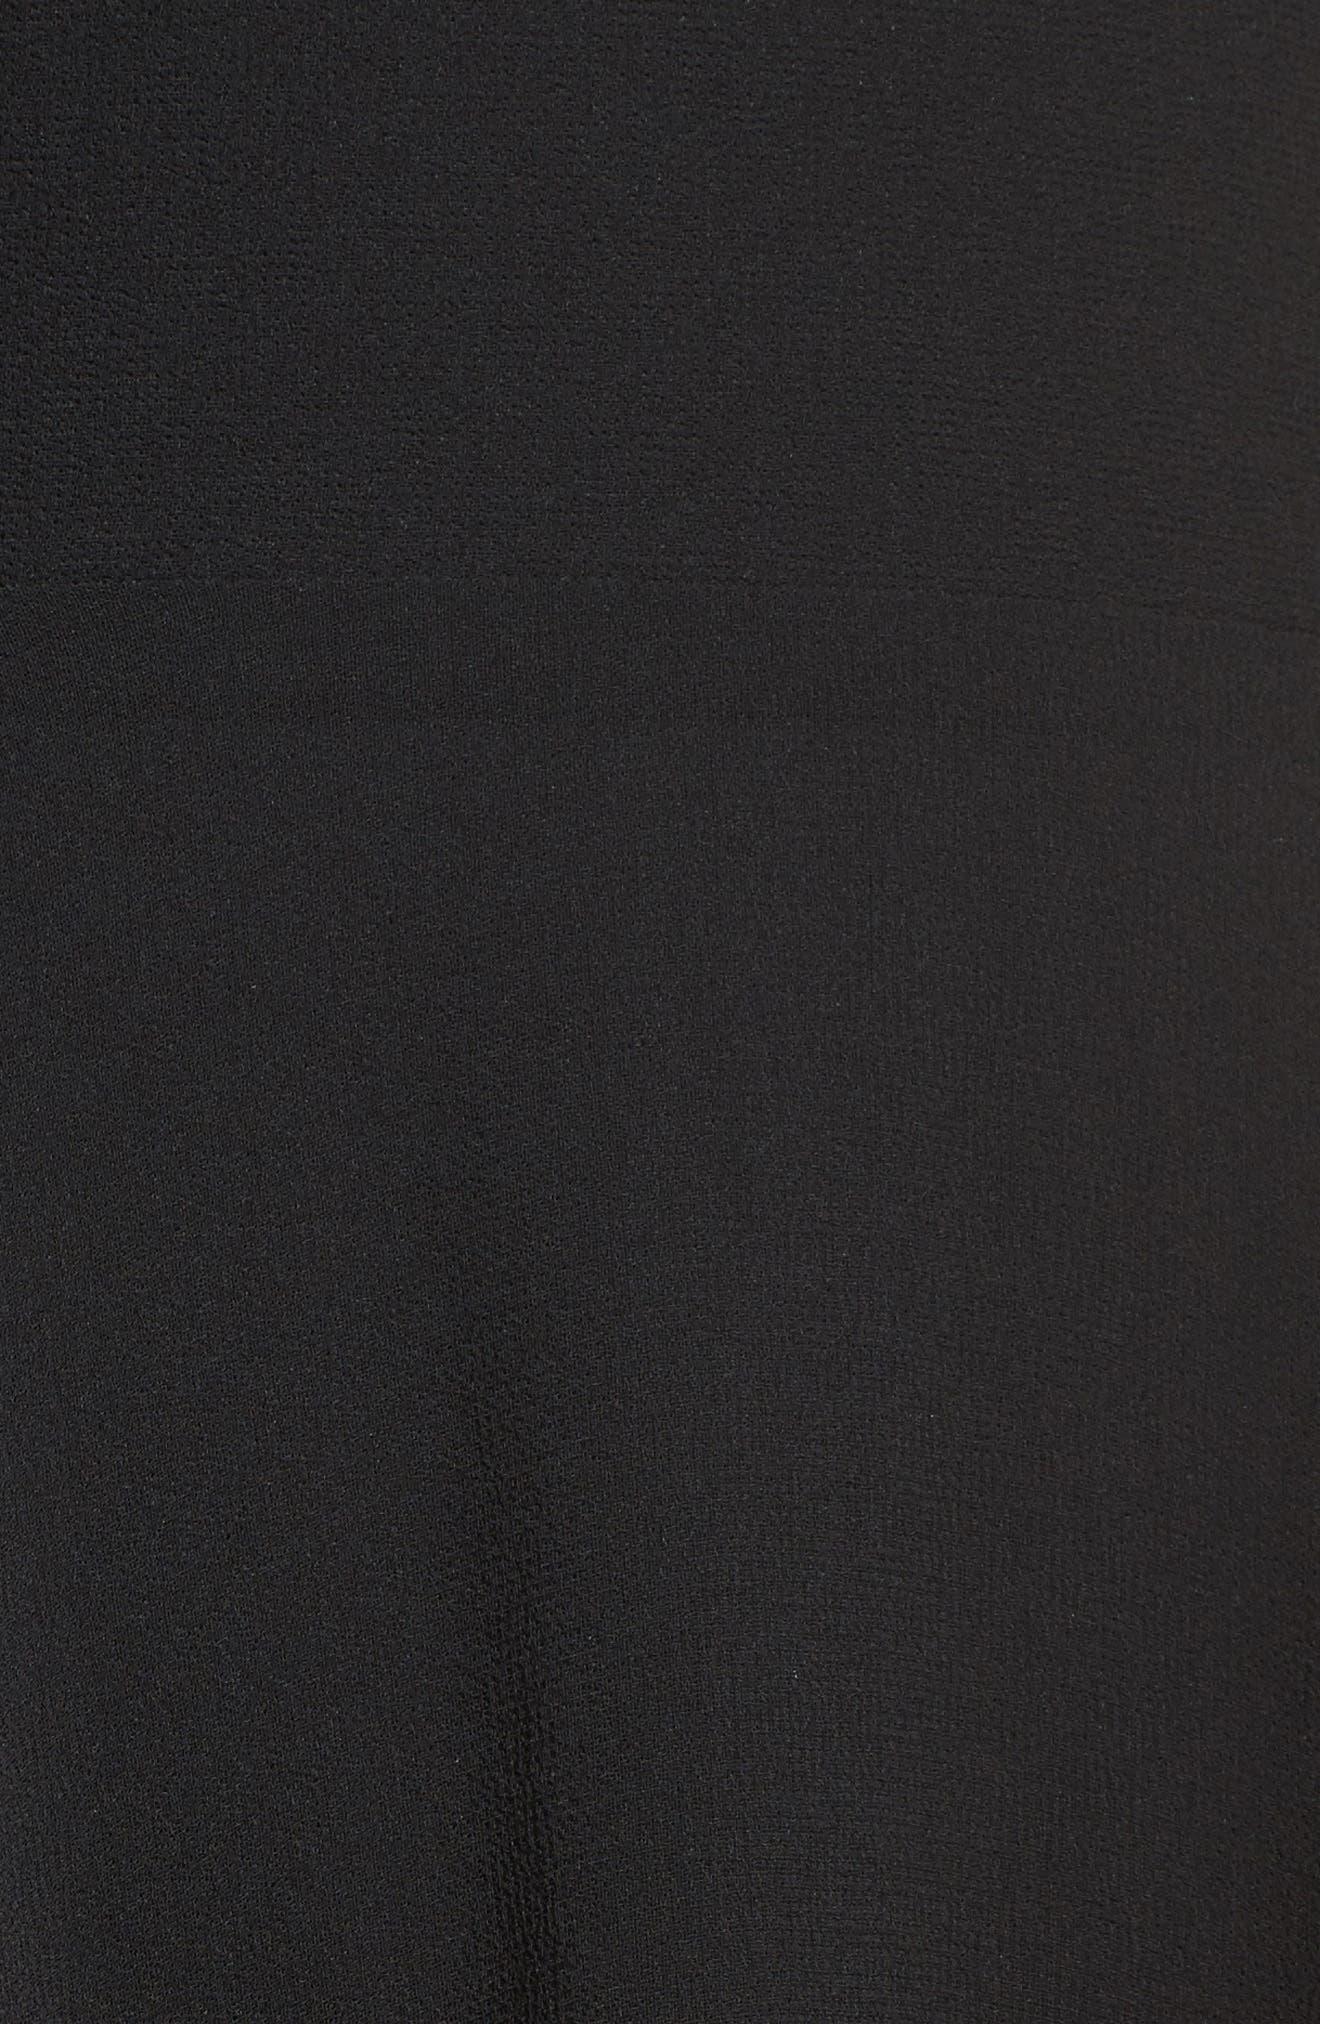 Lace Trim Chiffon Maxi Dress,                             Alternate thumbnail 5, color,                             Black